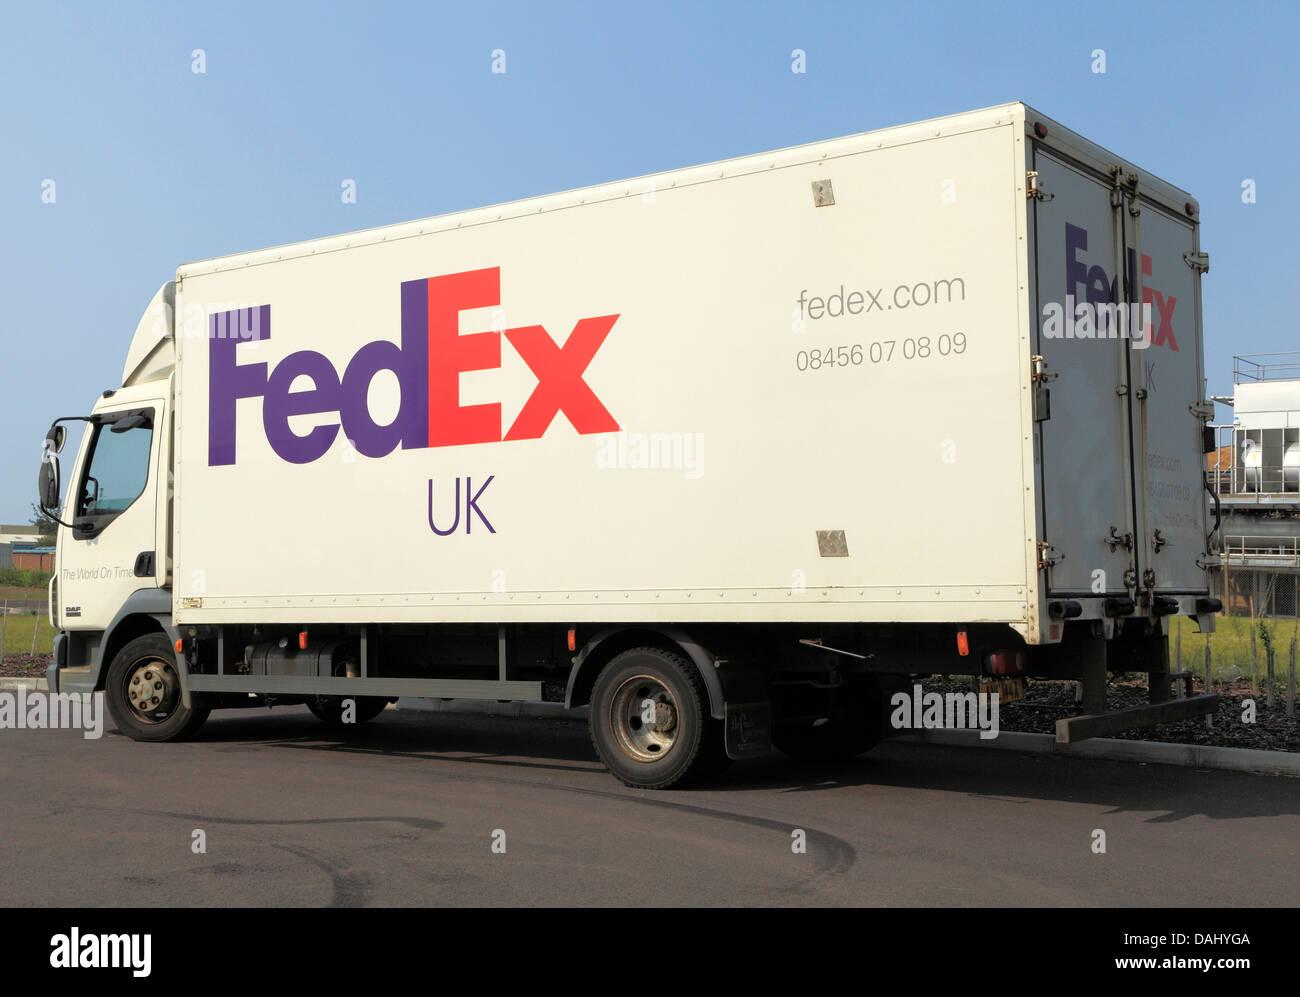 Fed Ex Transport Transporter LKW LKW Fahrzeug England UK FedEx Zeichen logo Stockbild